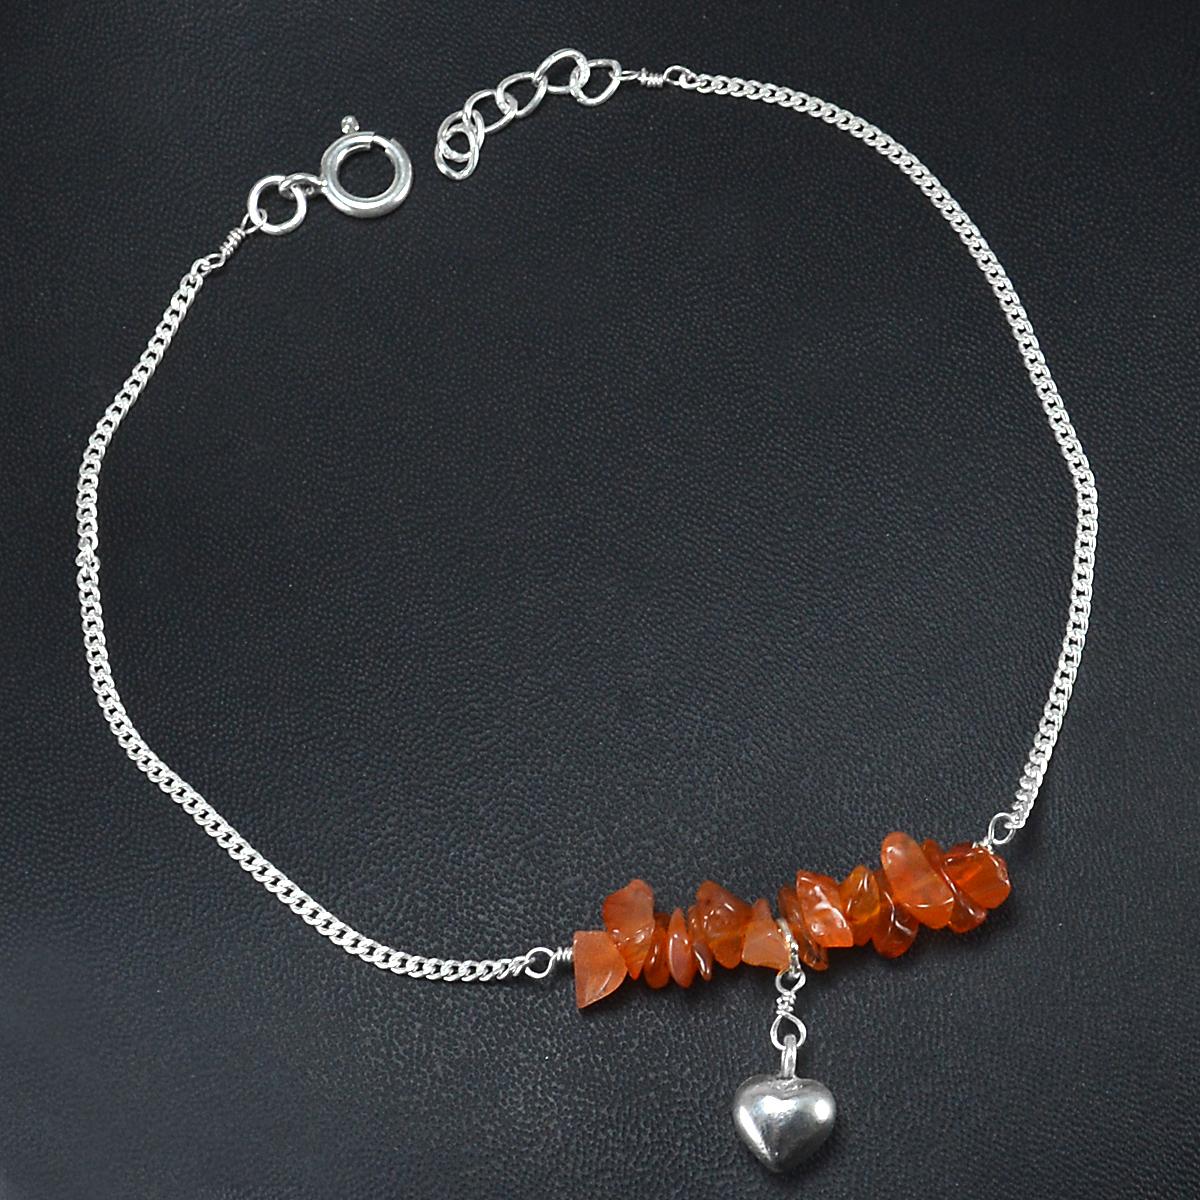 Carnelian Gemstone Jaipur Rajasthan India 925 Sterling Silver Single Piece Anklet Handmade Jewelry Manufacturer